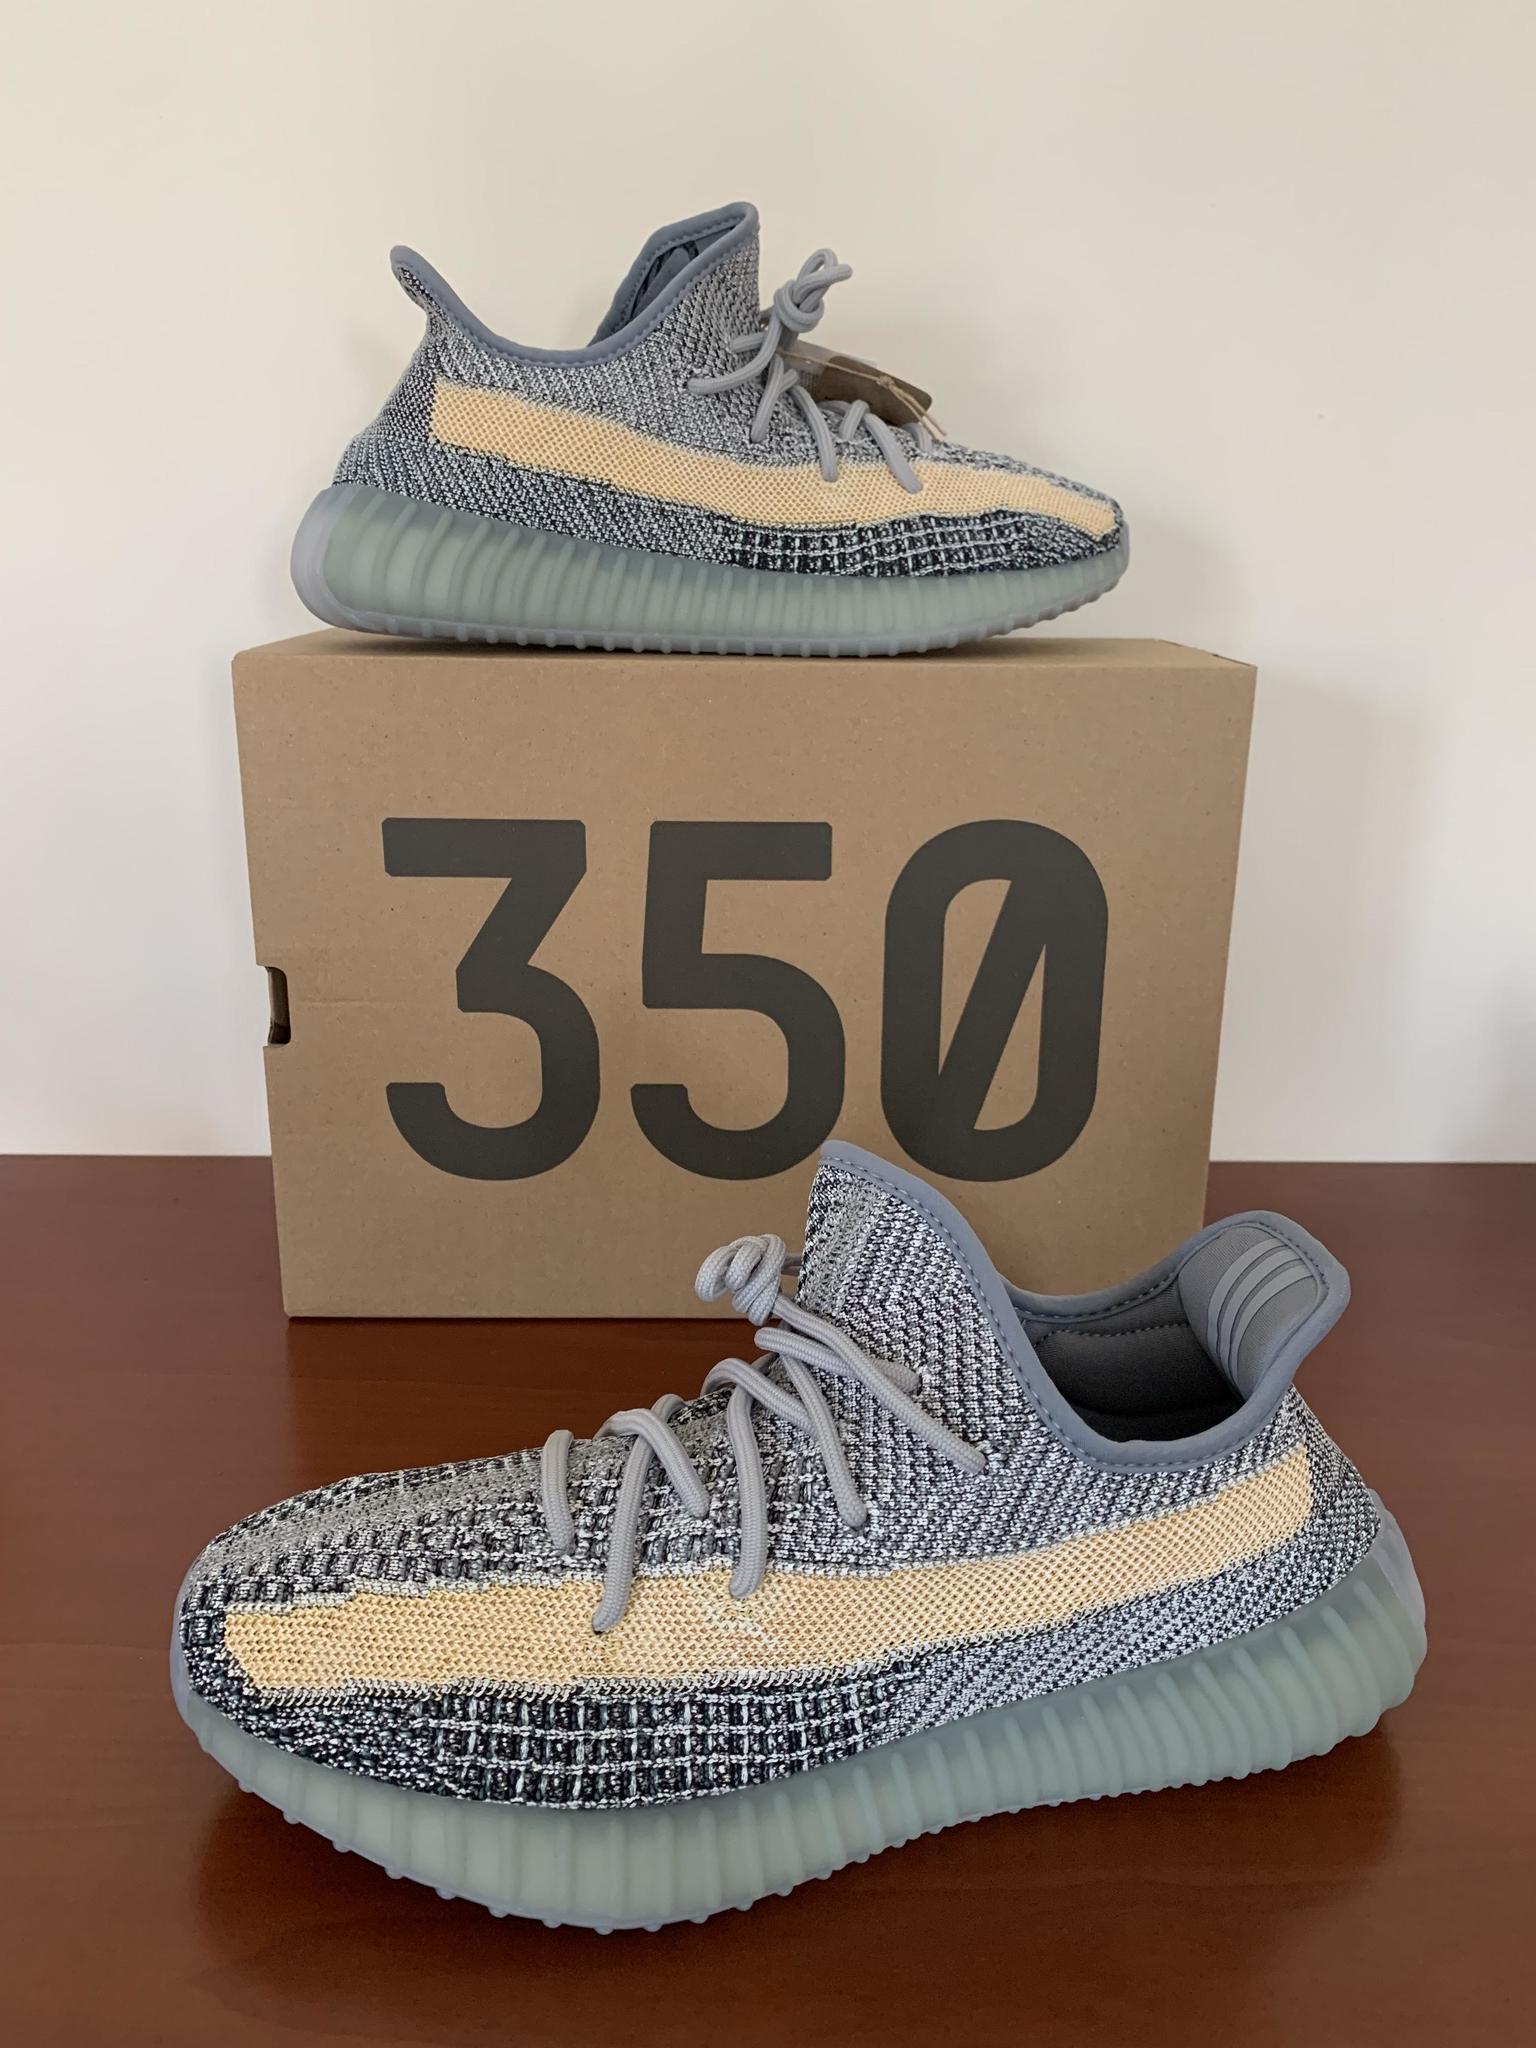 Yeezy Boost 350 Ash Blue (US10/EU44)